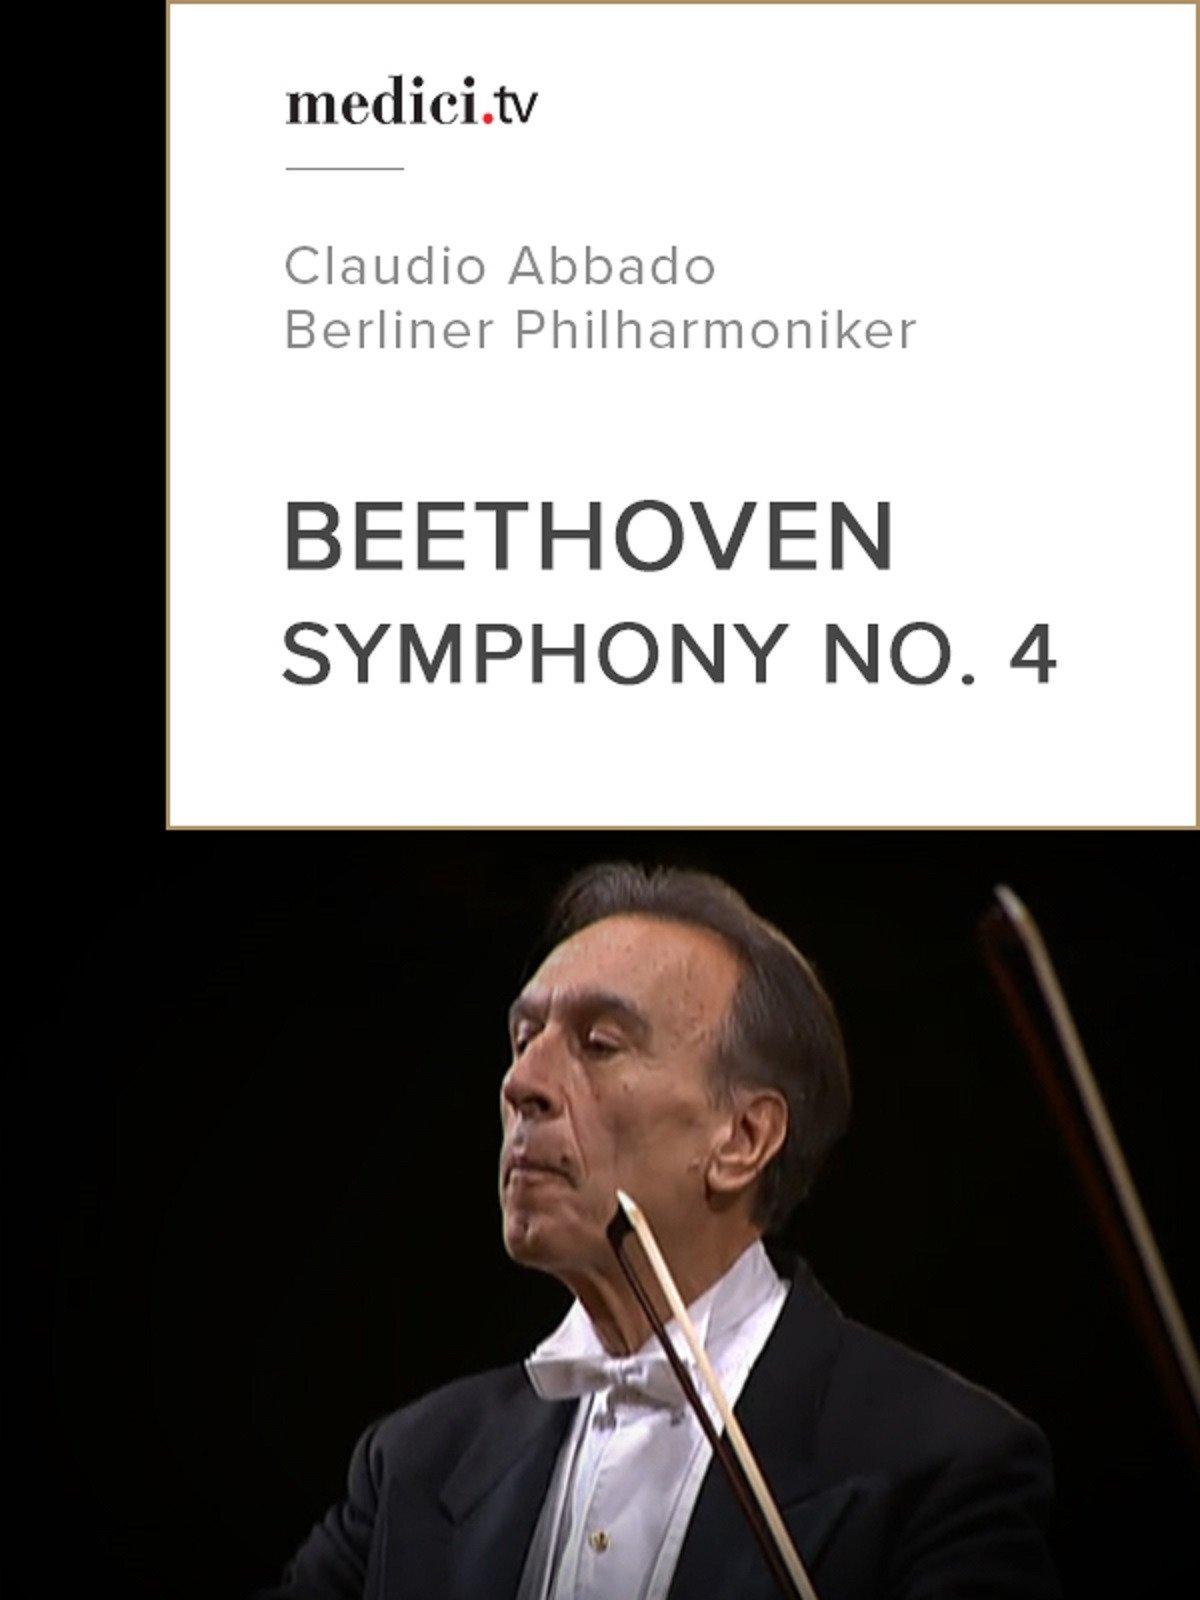 Beethoven, Symphony No. 4